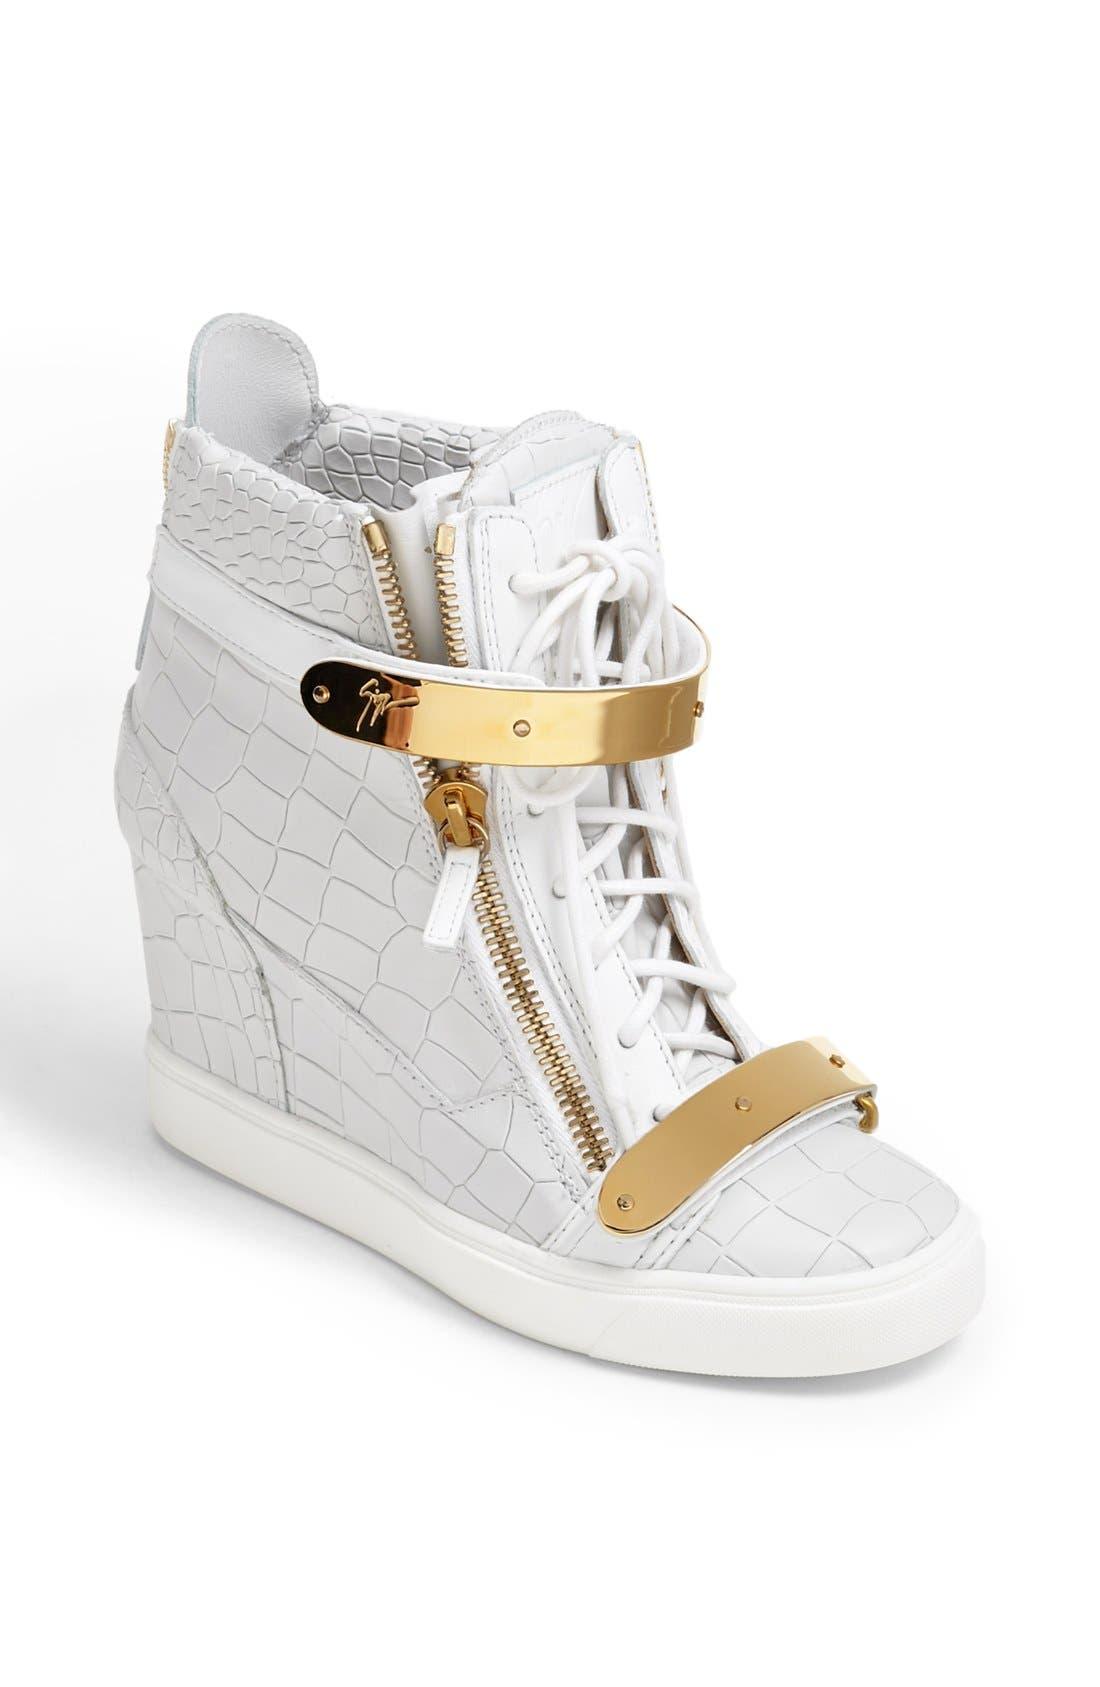 Main Image - Giuseppe Zanotti 'Lorenz' High Top Wedge Sneaker